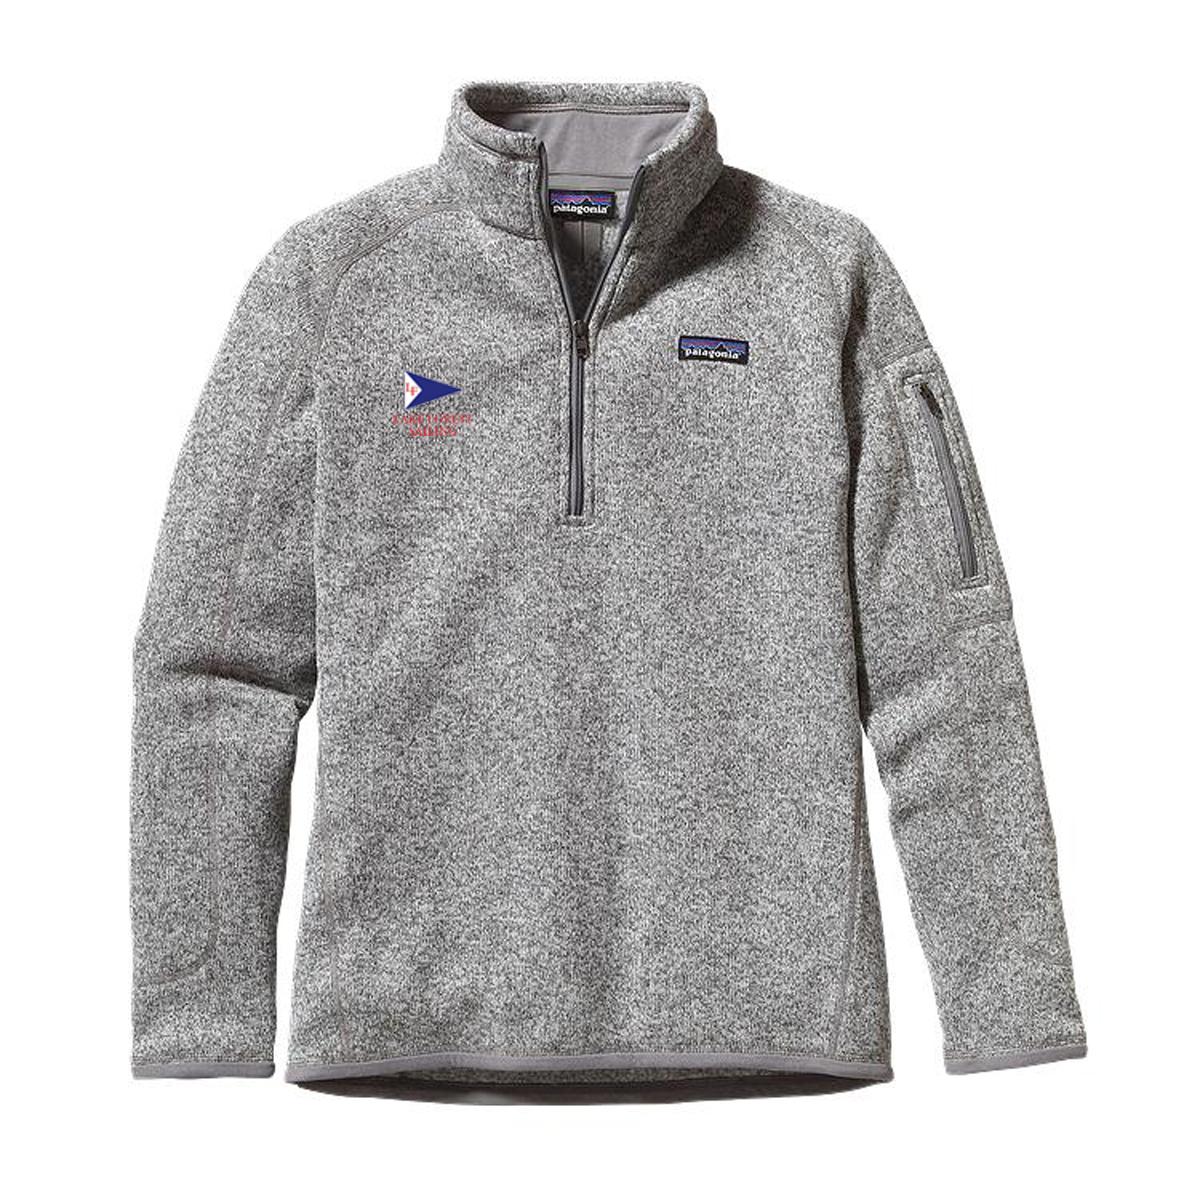 Lake Forest Sailing - Patagonia Women's Better Sweater 1/4 Zip